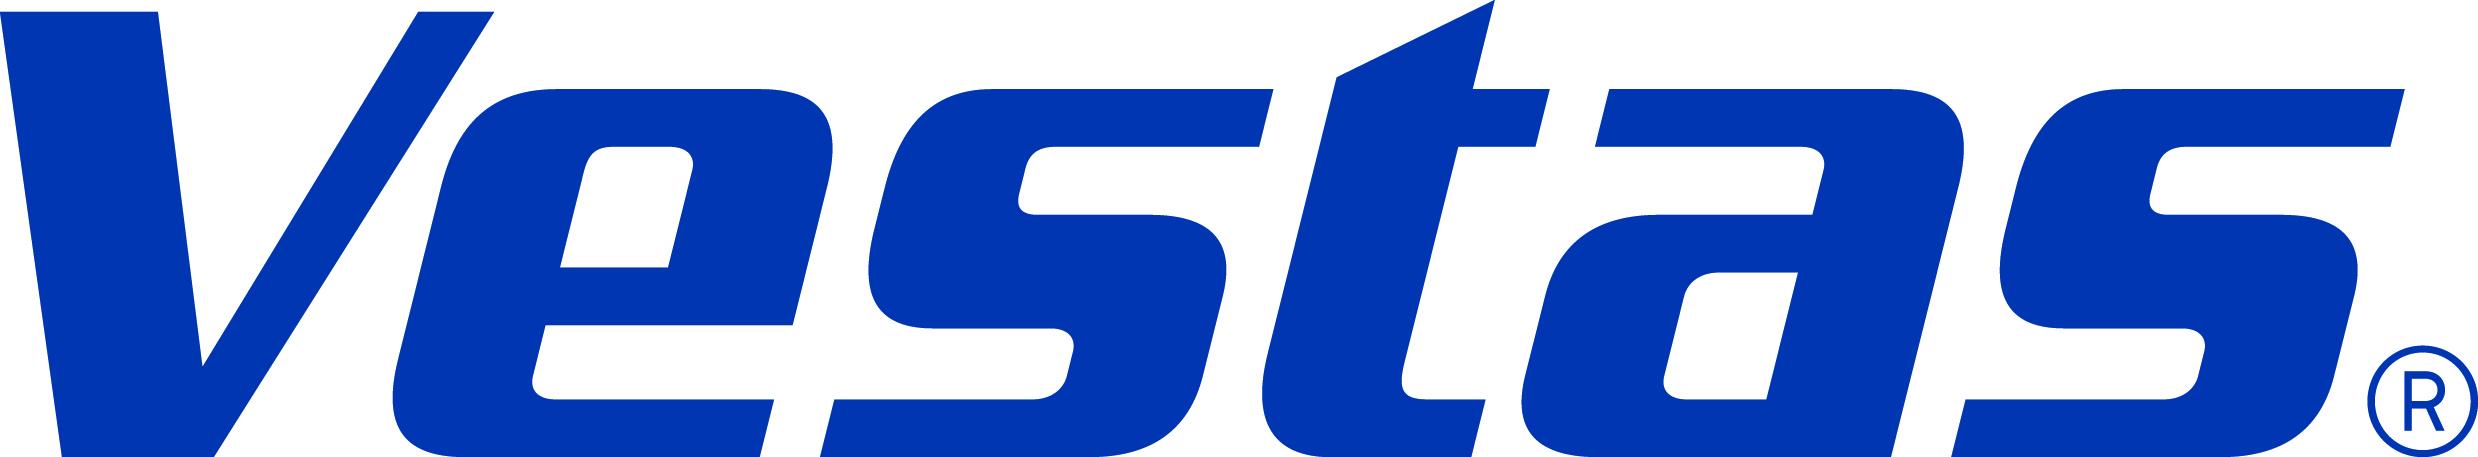 Vestas logo_CMYK_210.jpg